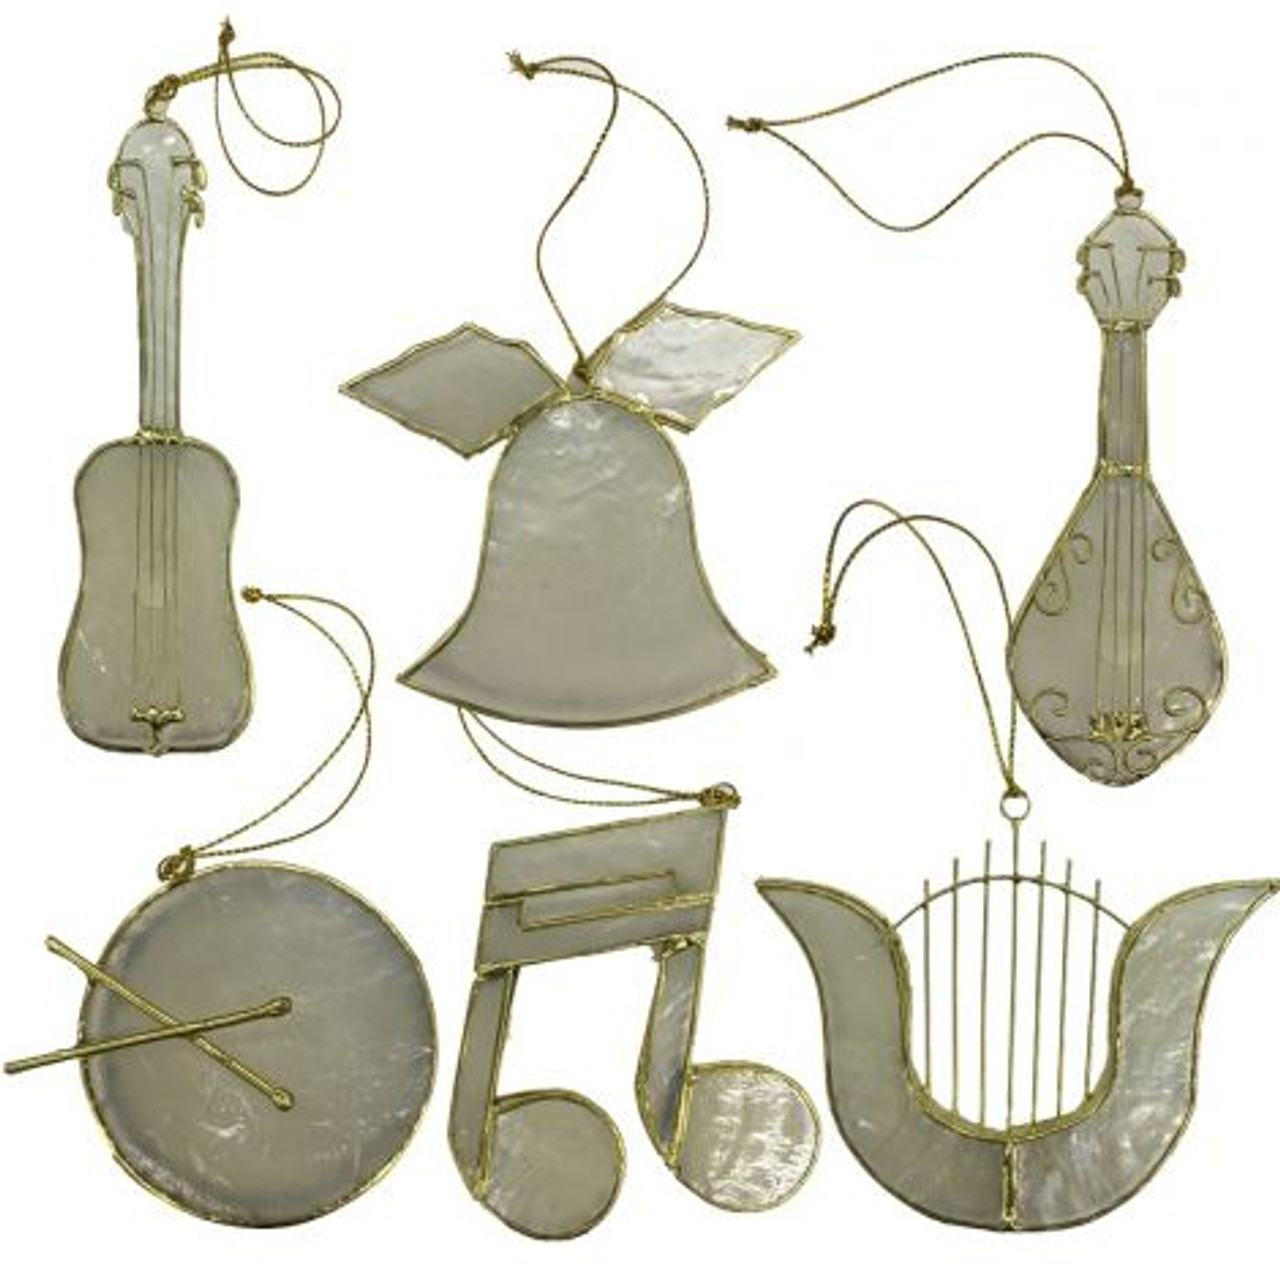 Capiz Music Ornaments - Set of 6  - Complete Set